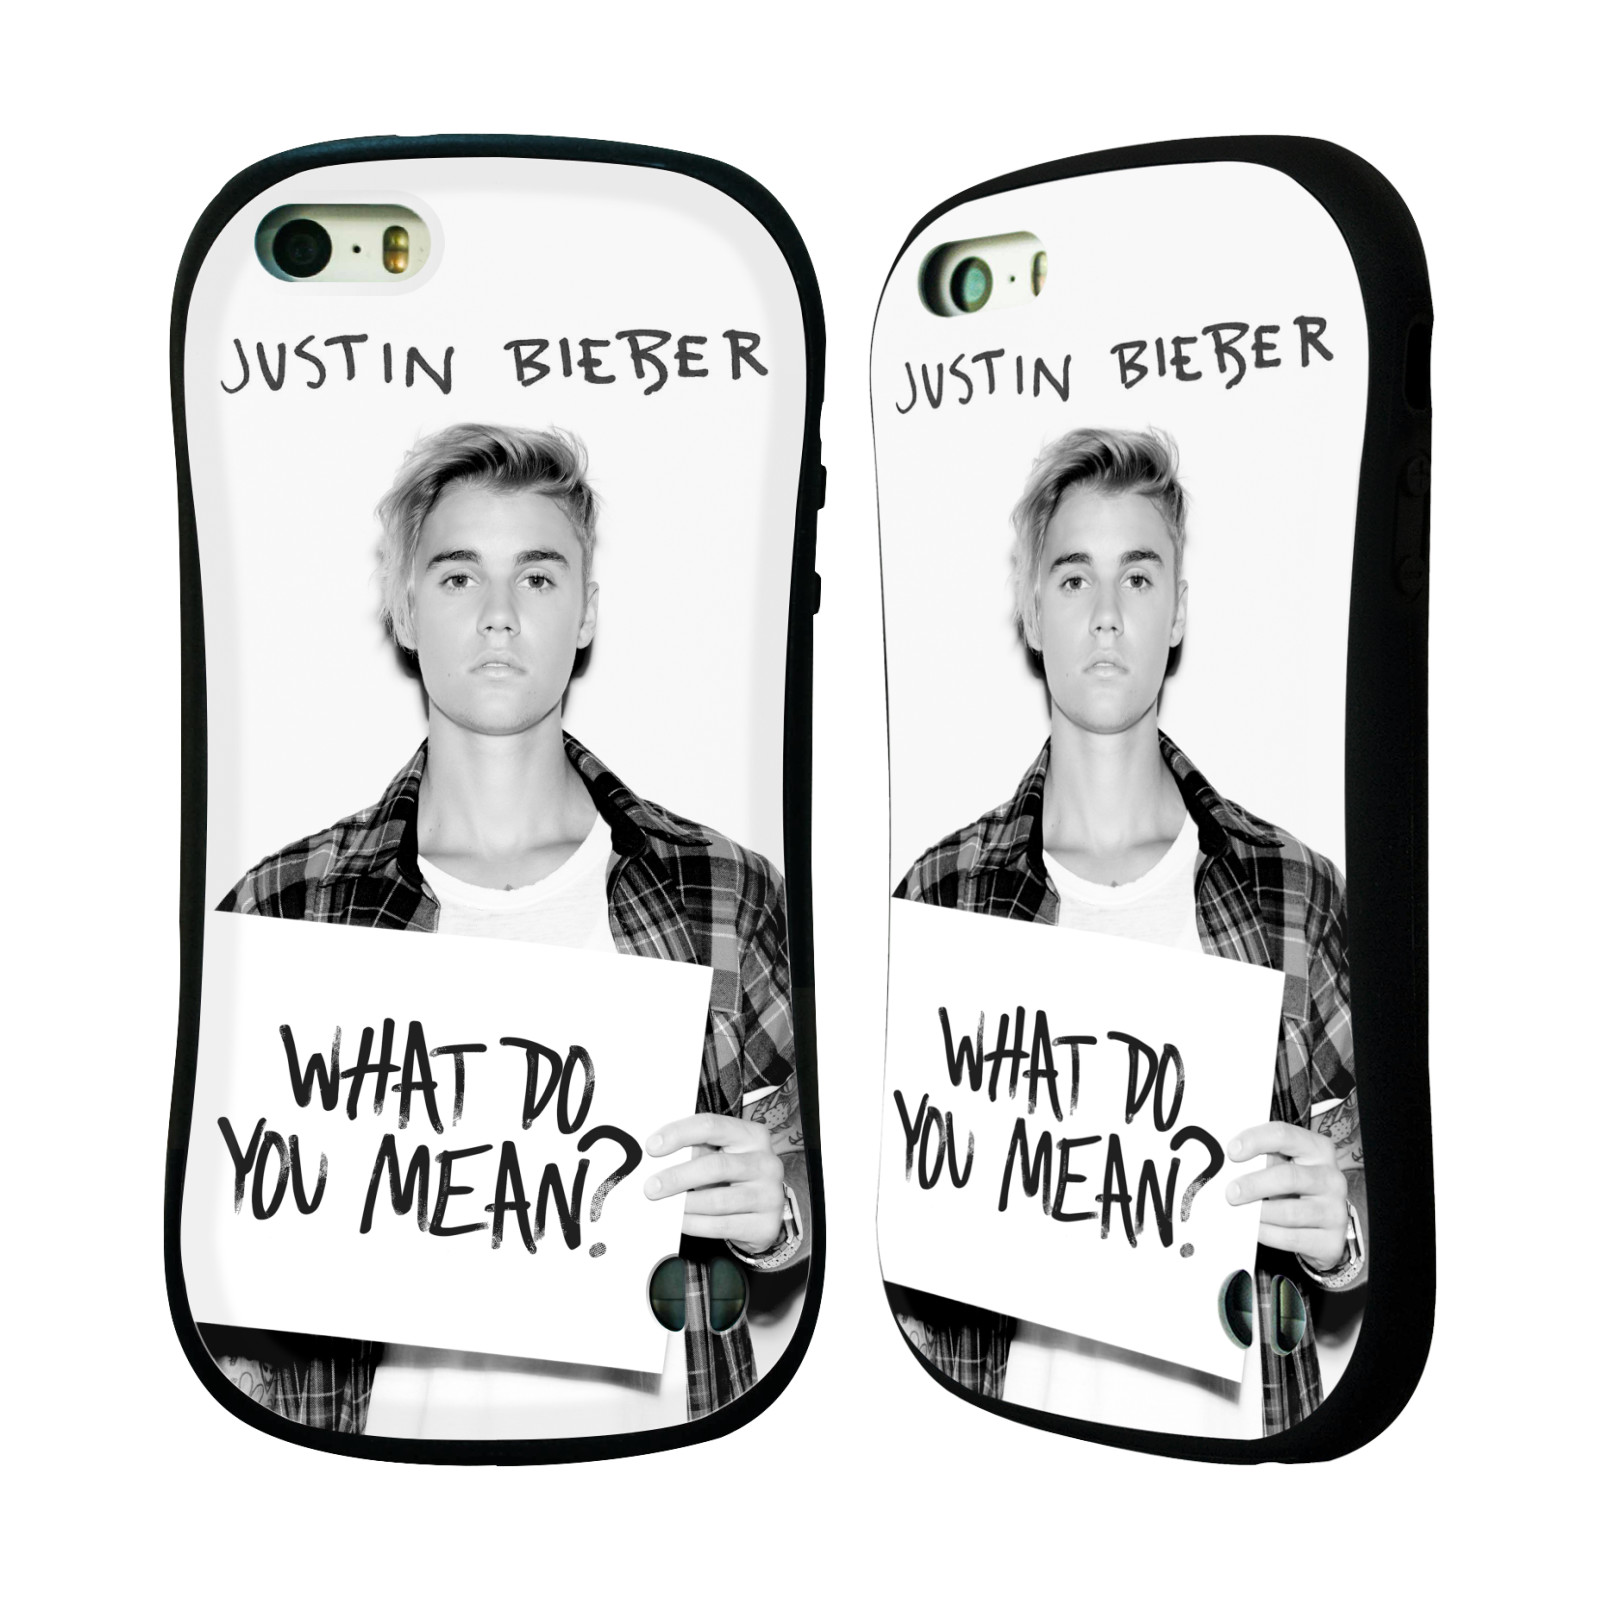 HEAD CASE silikon/plast odolný obal na mobil Apple Iphone 5 / 5S originální potisk Justin Bieber What do you mean